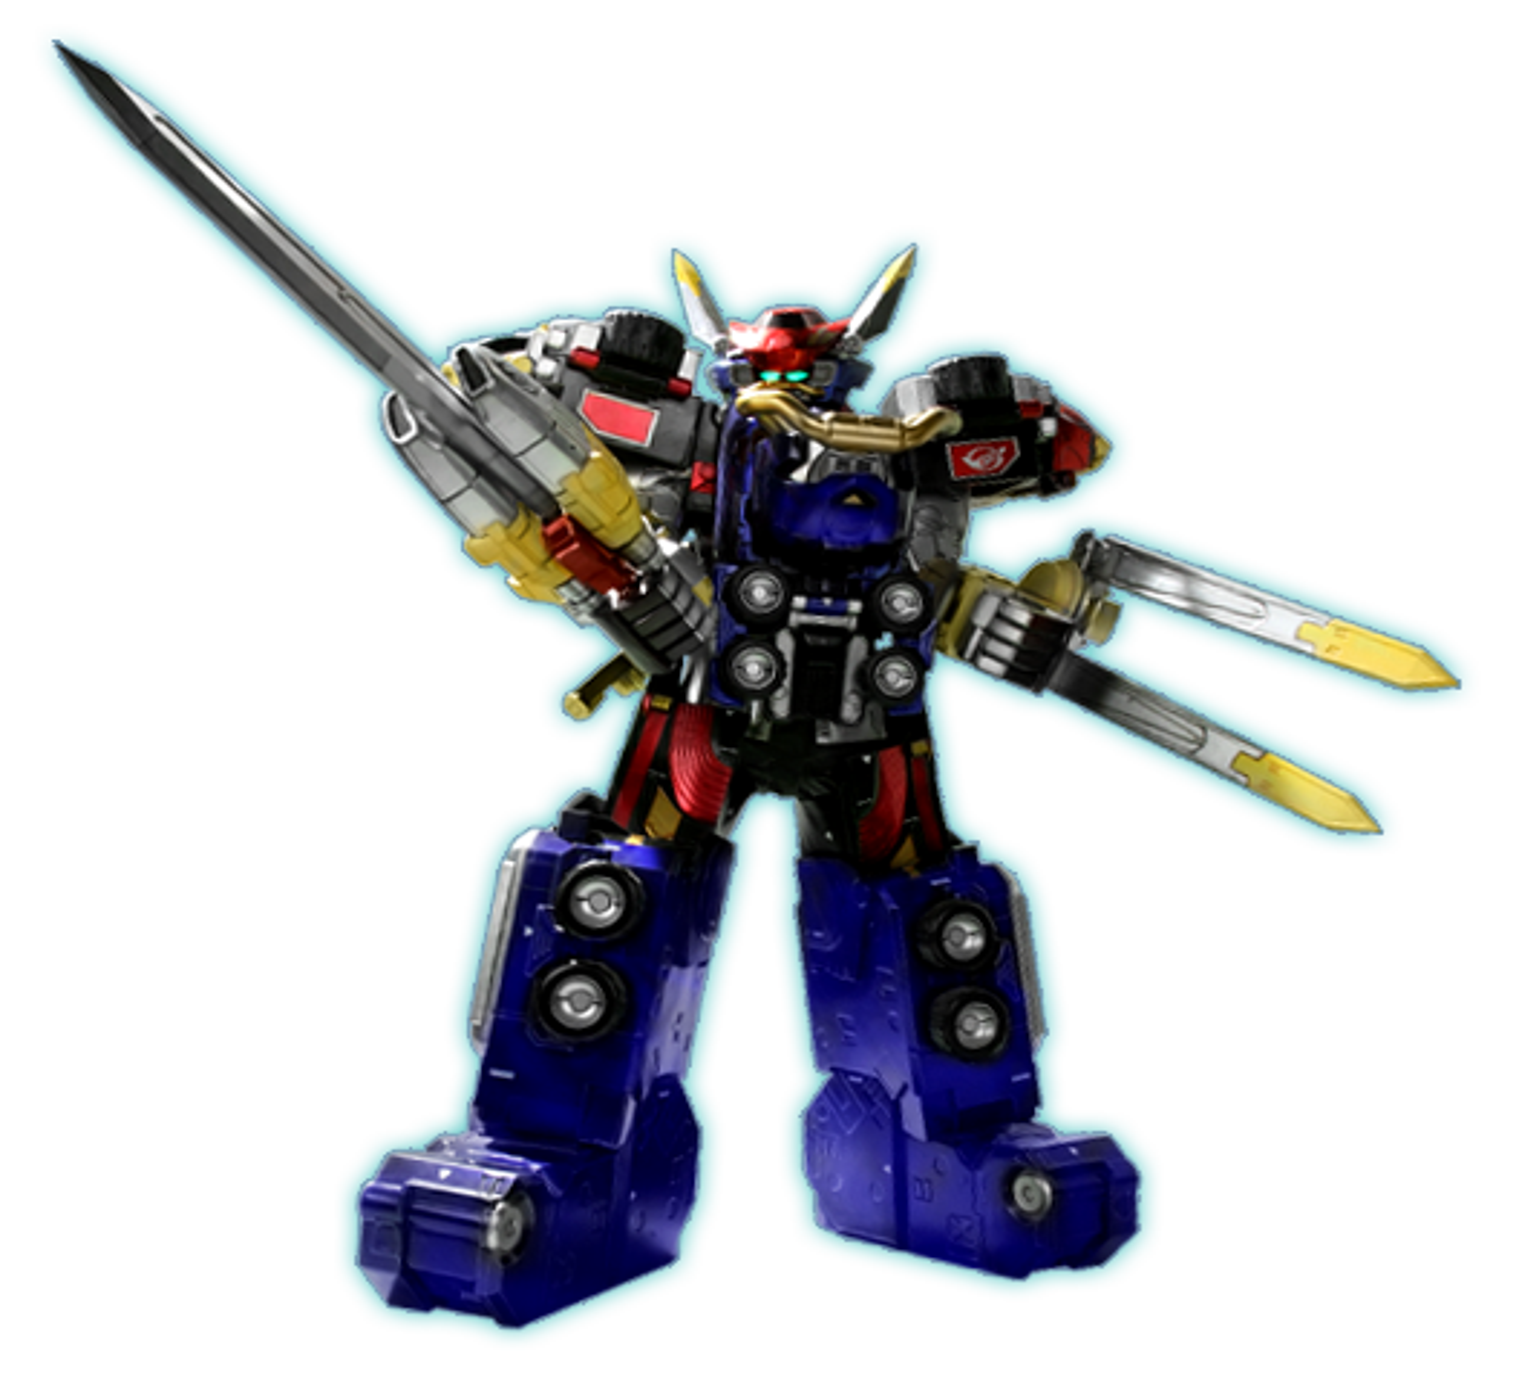 Comparison:Tokumei Gattai Go-Buster Oh vs. Beast-X Megazord